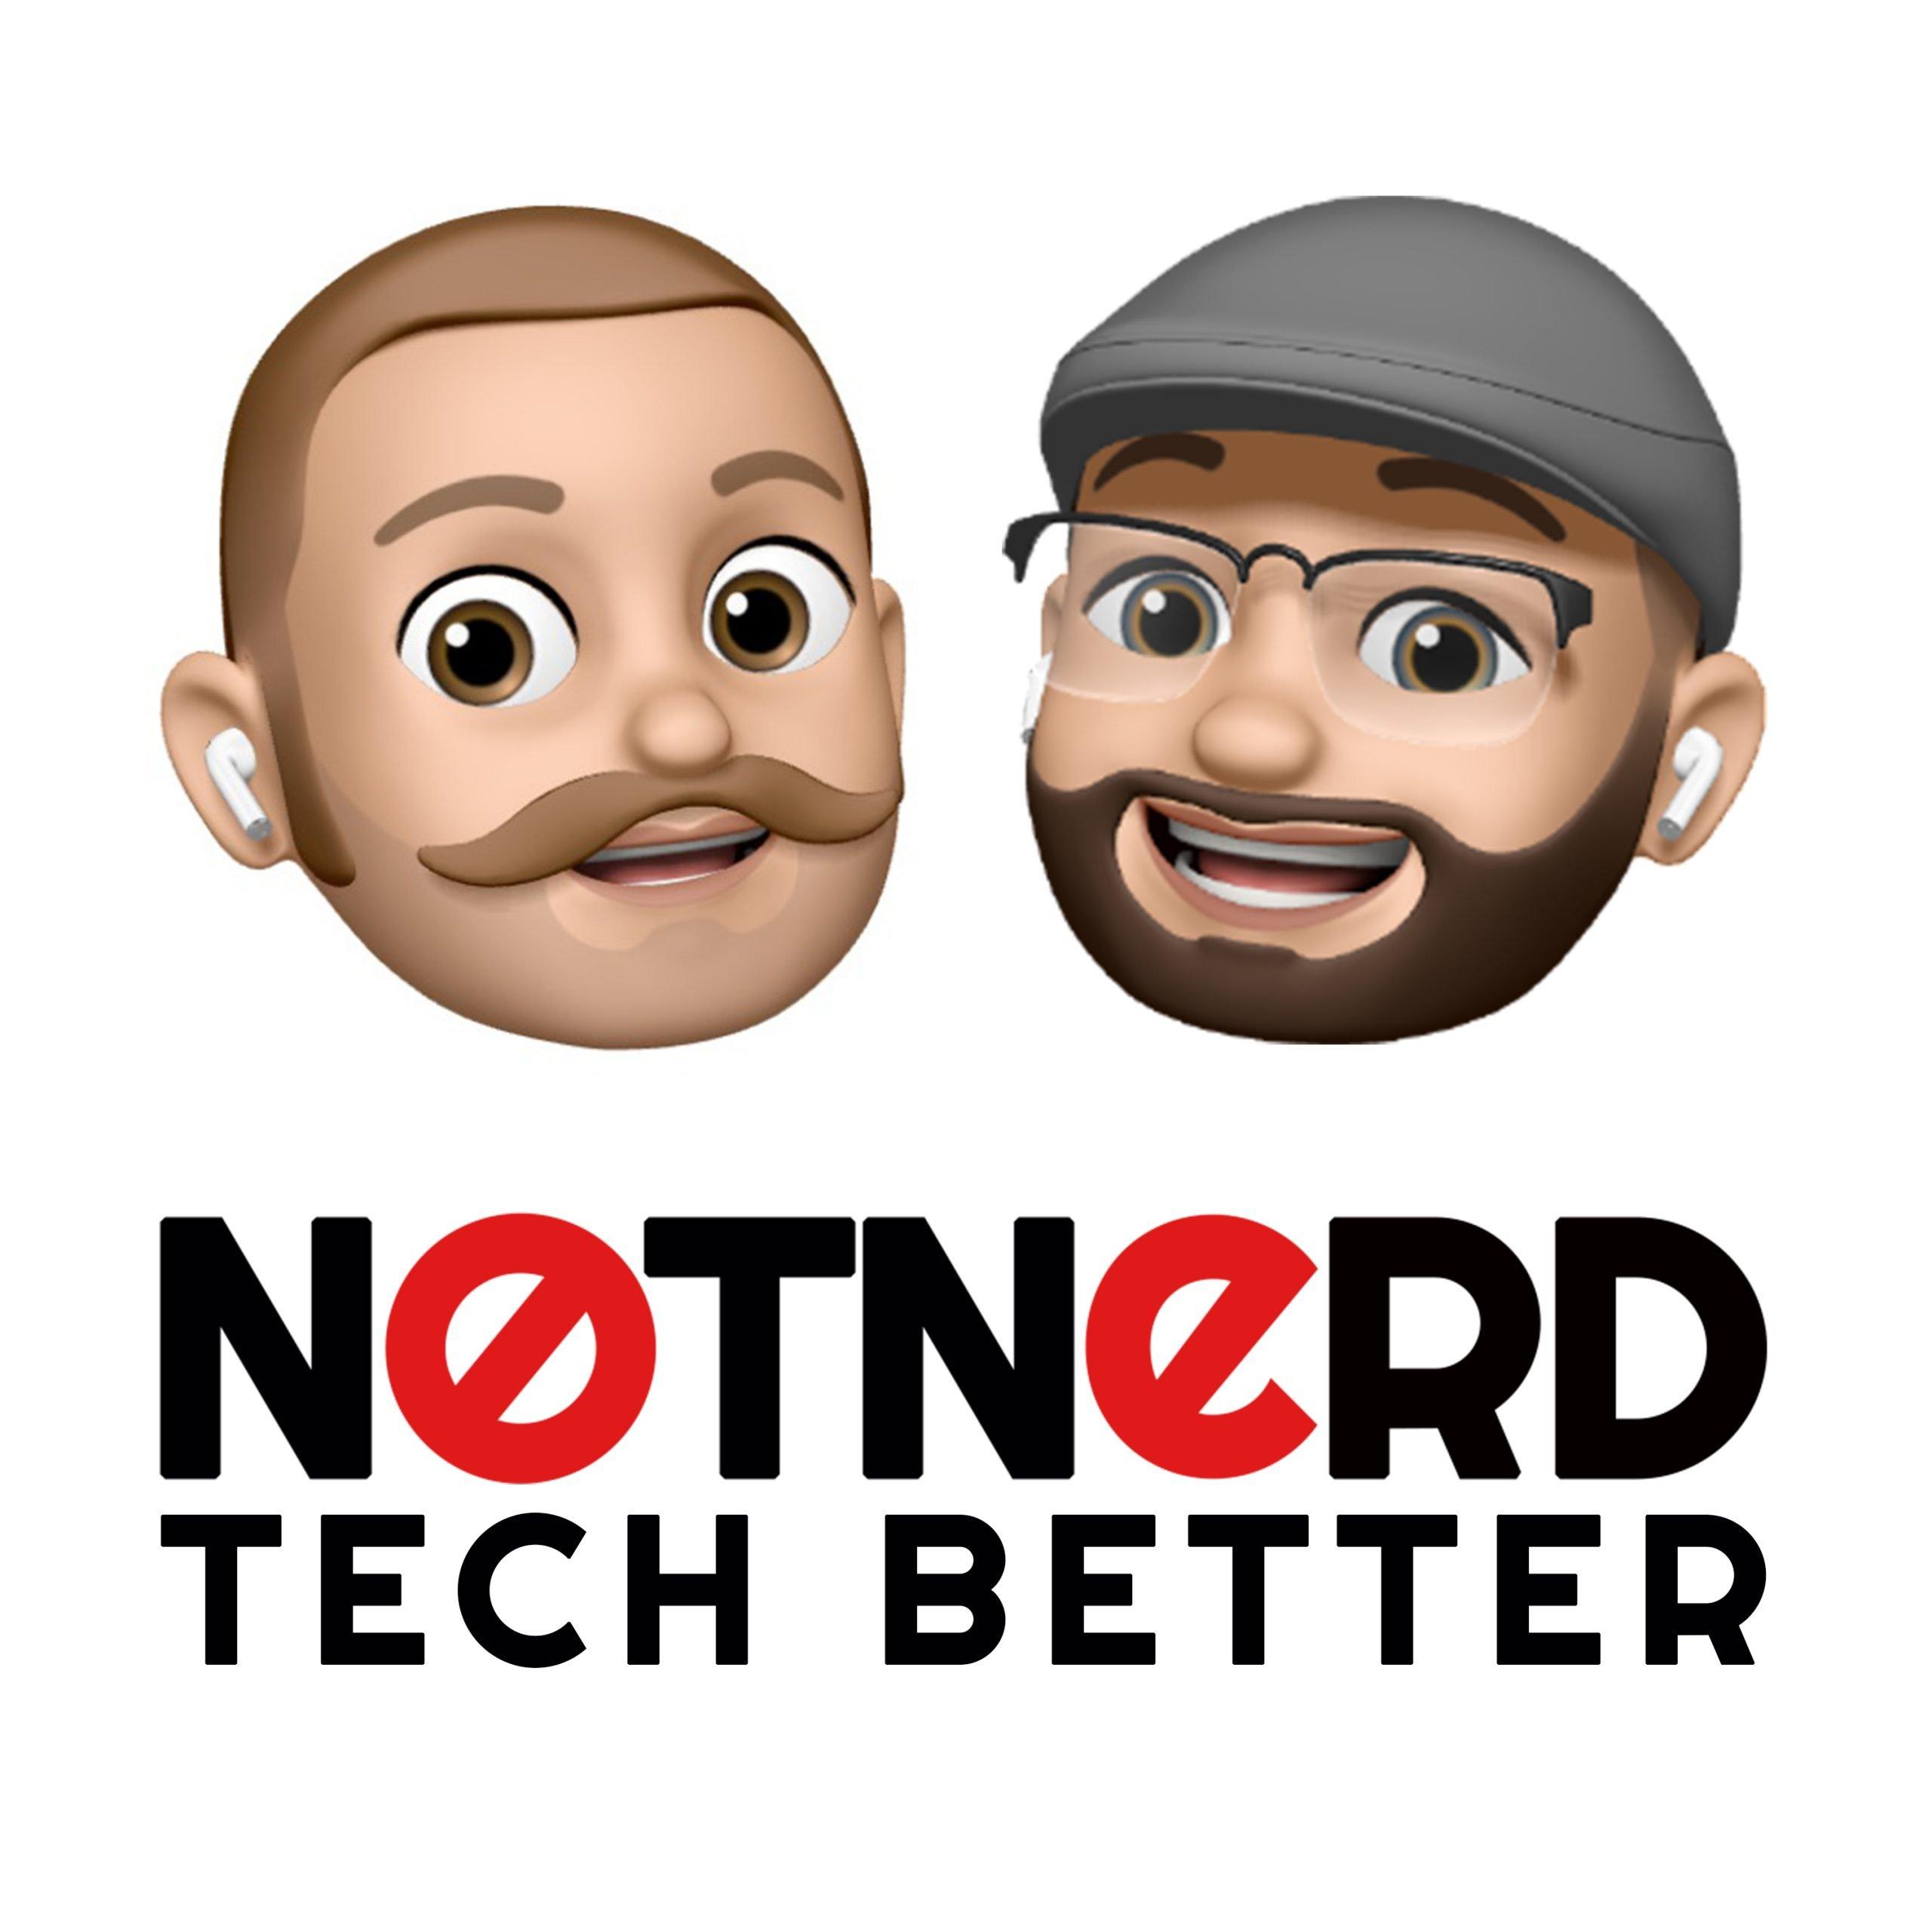 Notnerd Podcast - Tech Better